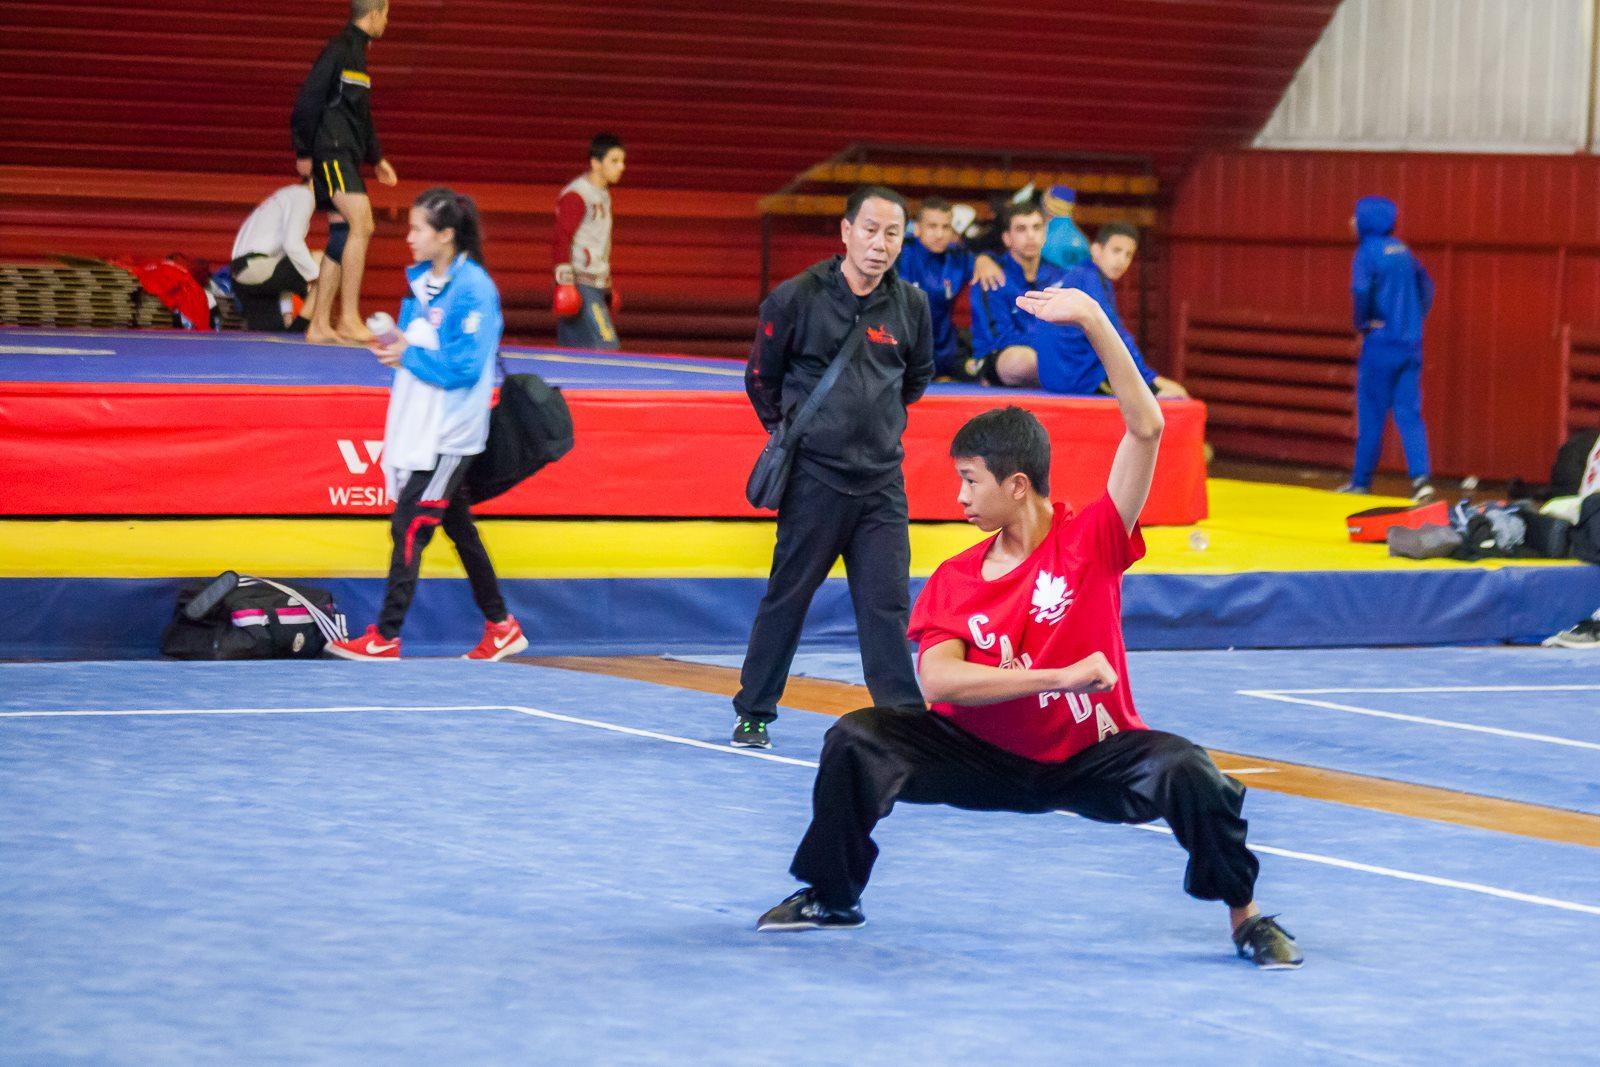 wayland_li_world_wushu_championships_sifu_training_2016_bulgaria_canada_2.jpg